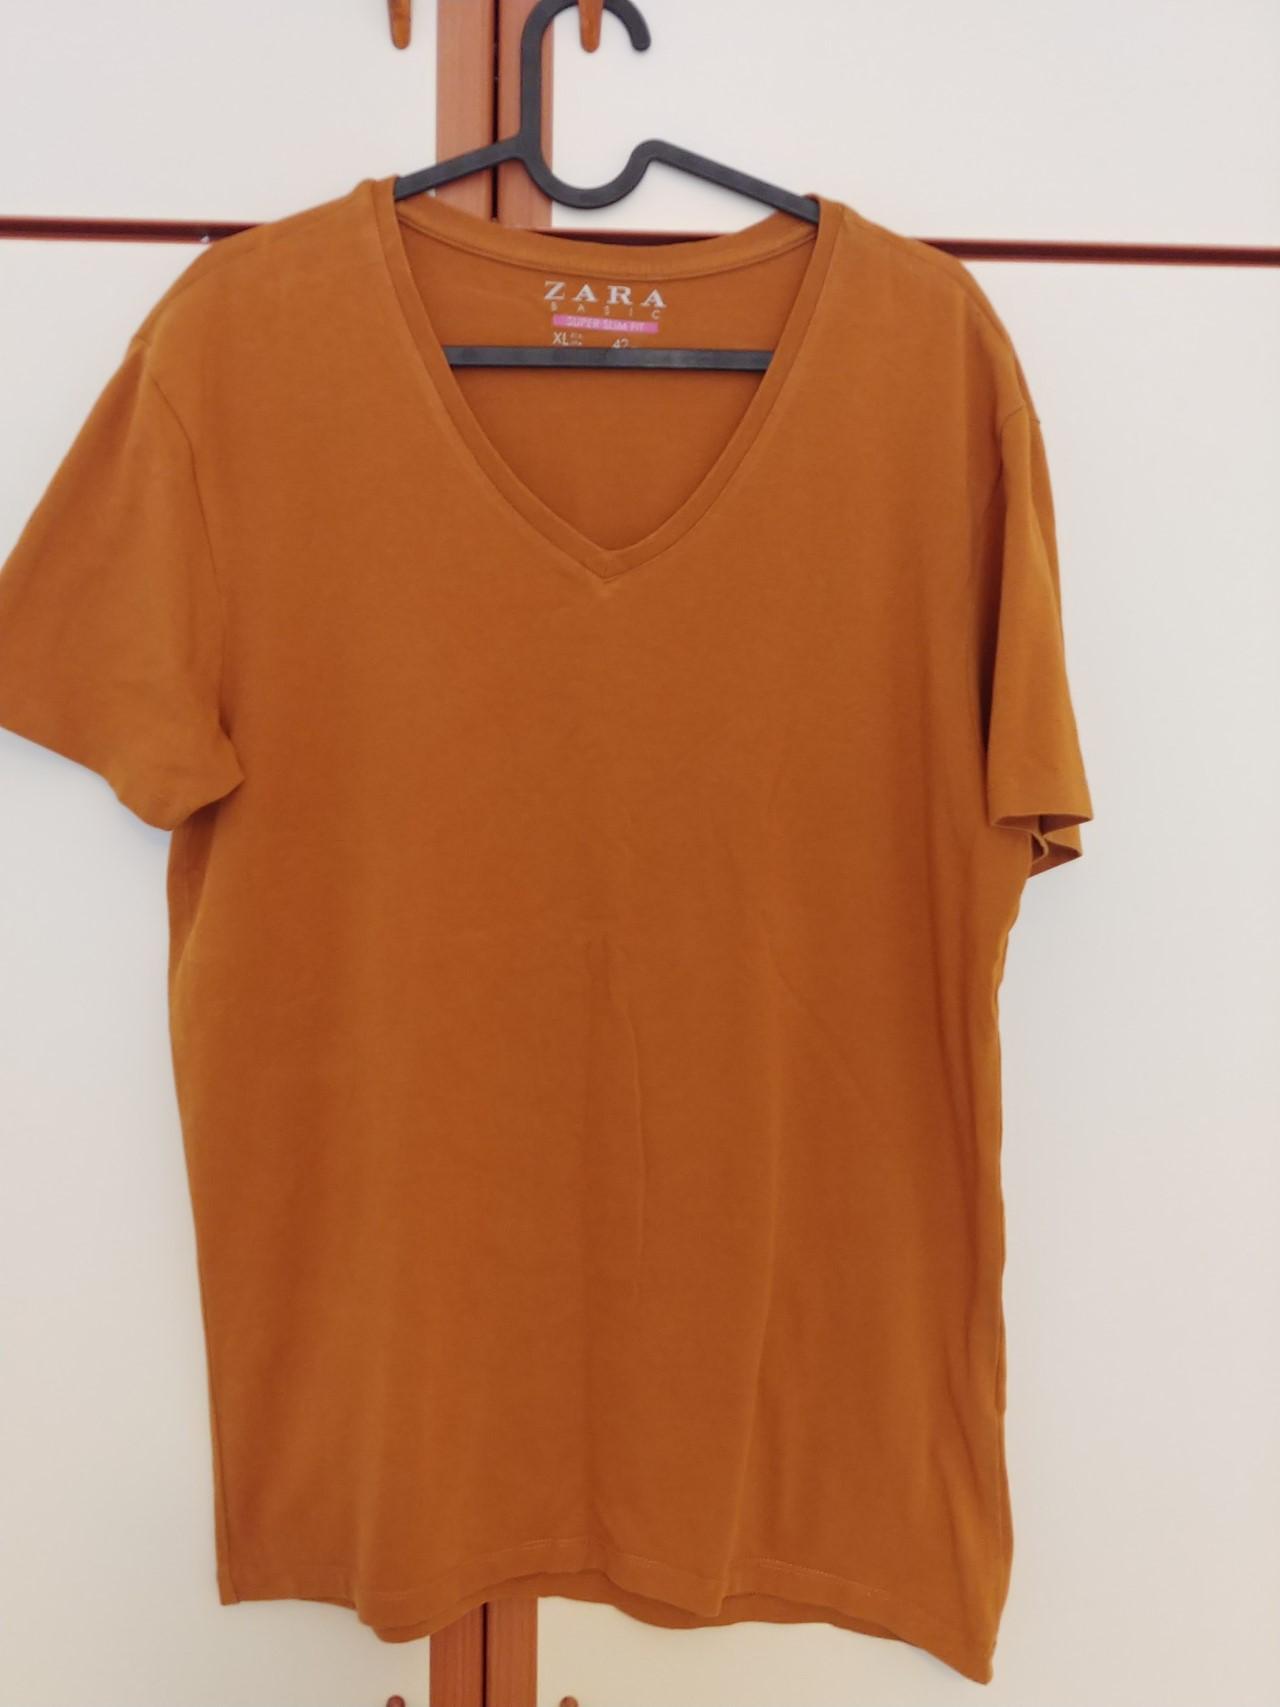 bbb714d380a6 ΕΚΛΕΙΣΕ  Πολλά επώνυμα αντρικά-νεανικά t-shirts No. L 40 - XARISETO.GR